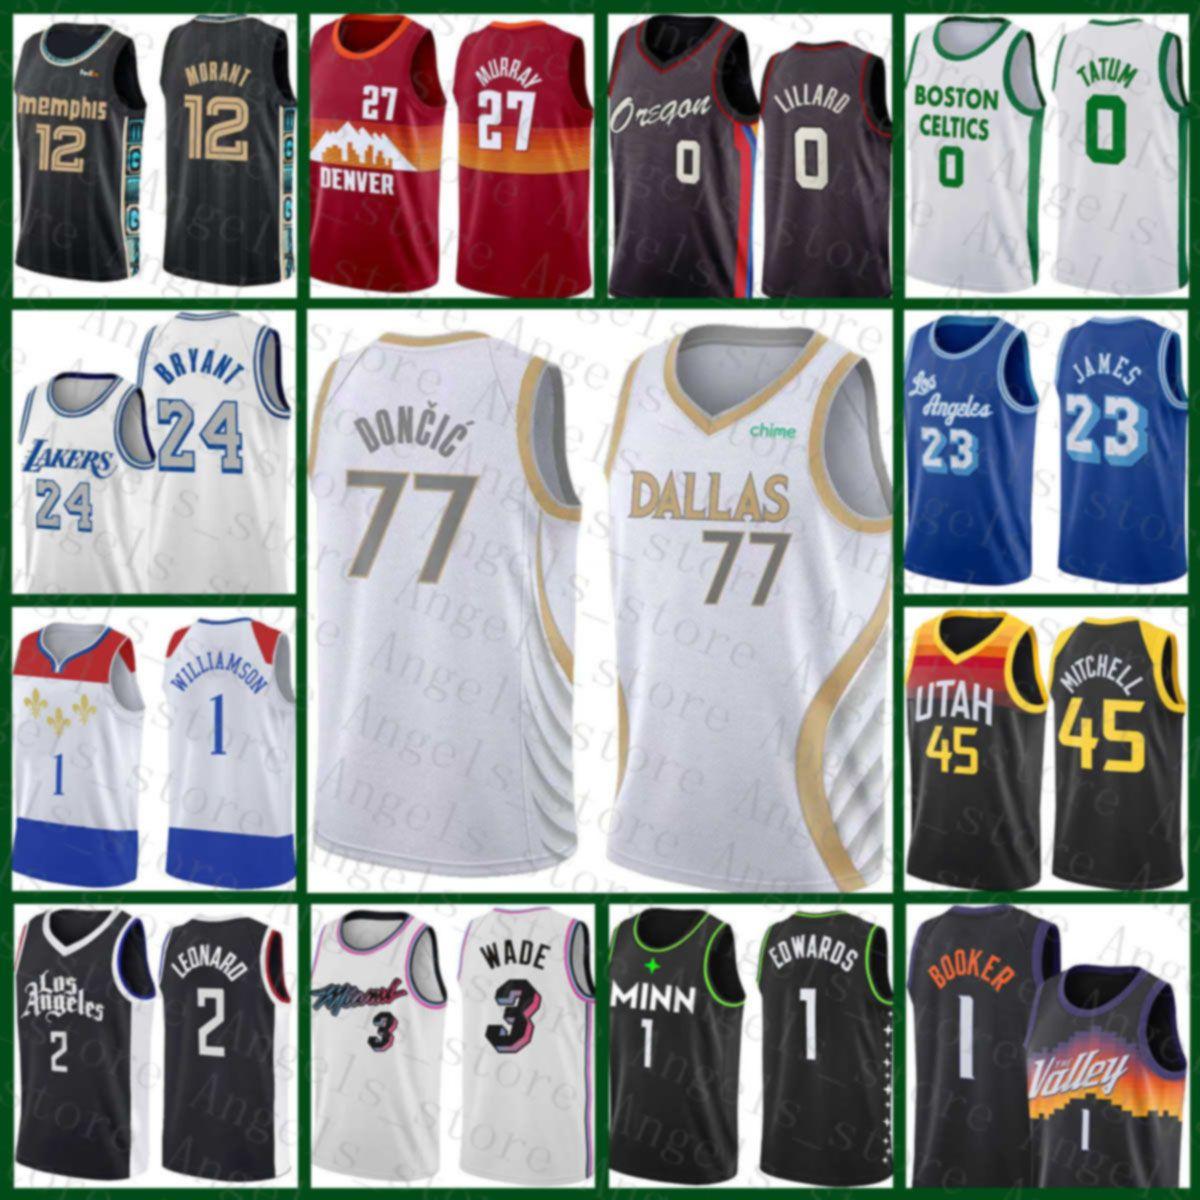 2020 2021 Nuova Jersey di pallacanestro Luka DallasMaverick 77 Doncic Lebron 23 James Tyler 14 Herro Dwayne Dwyane 3 Wade Jamal 27 Murray